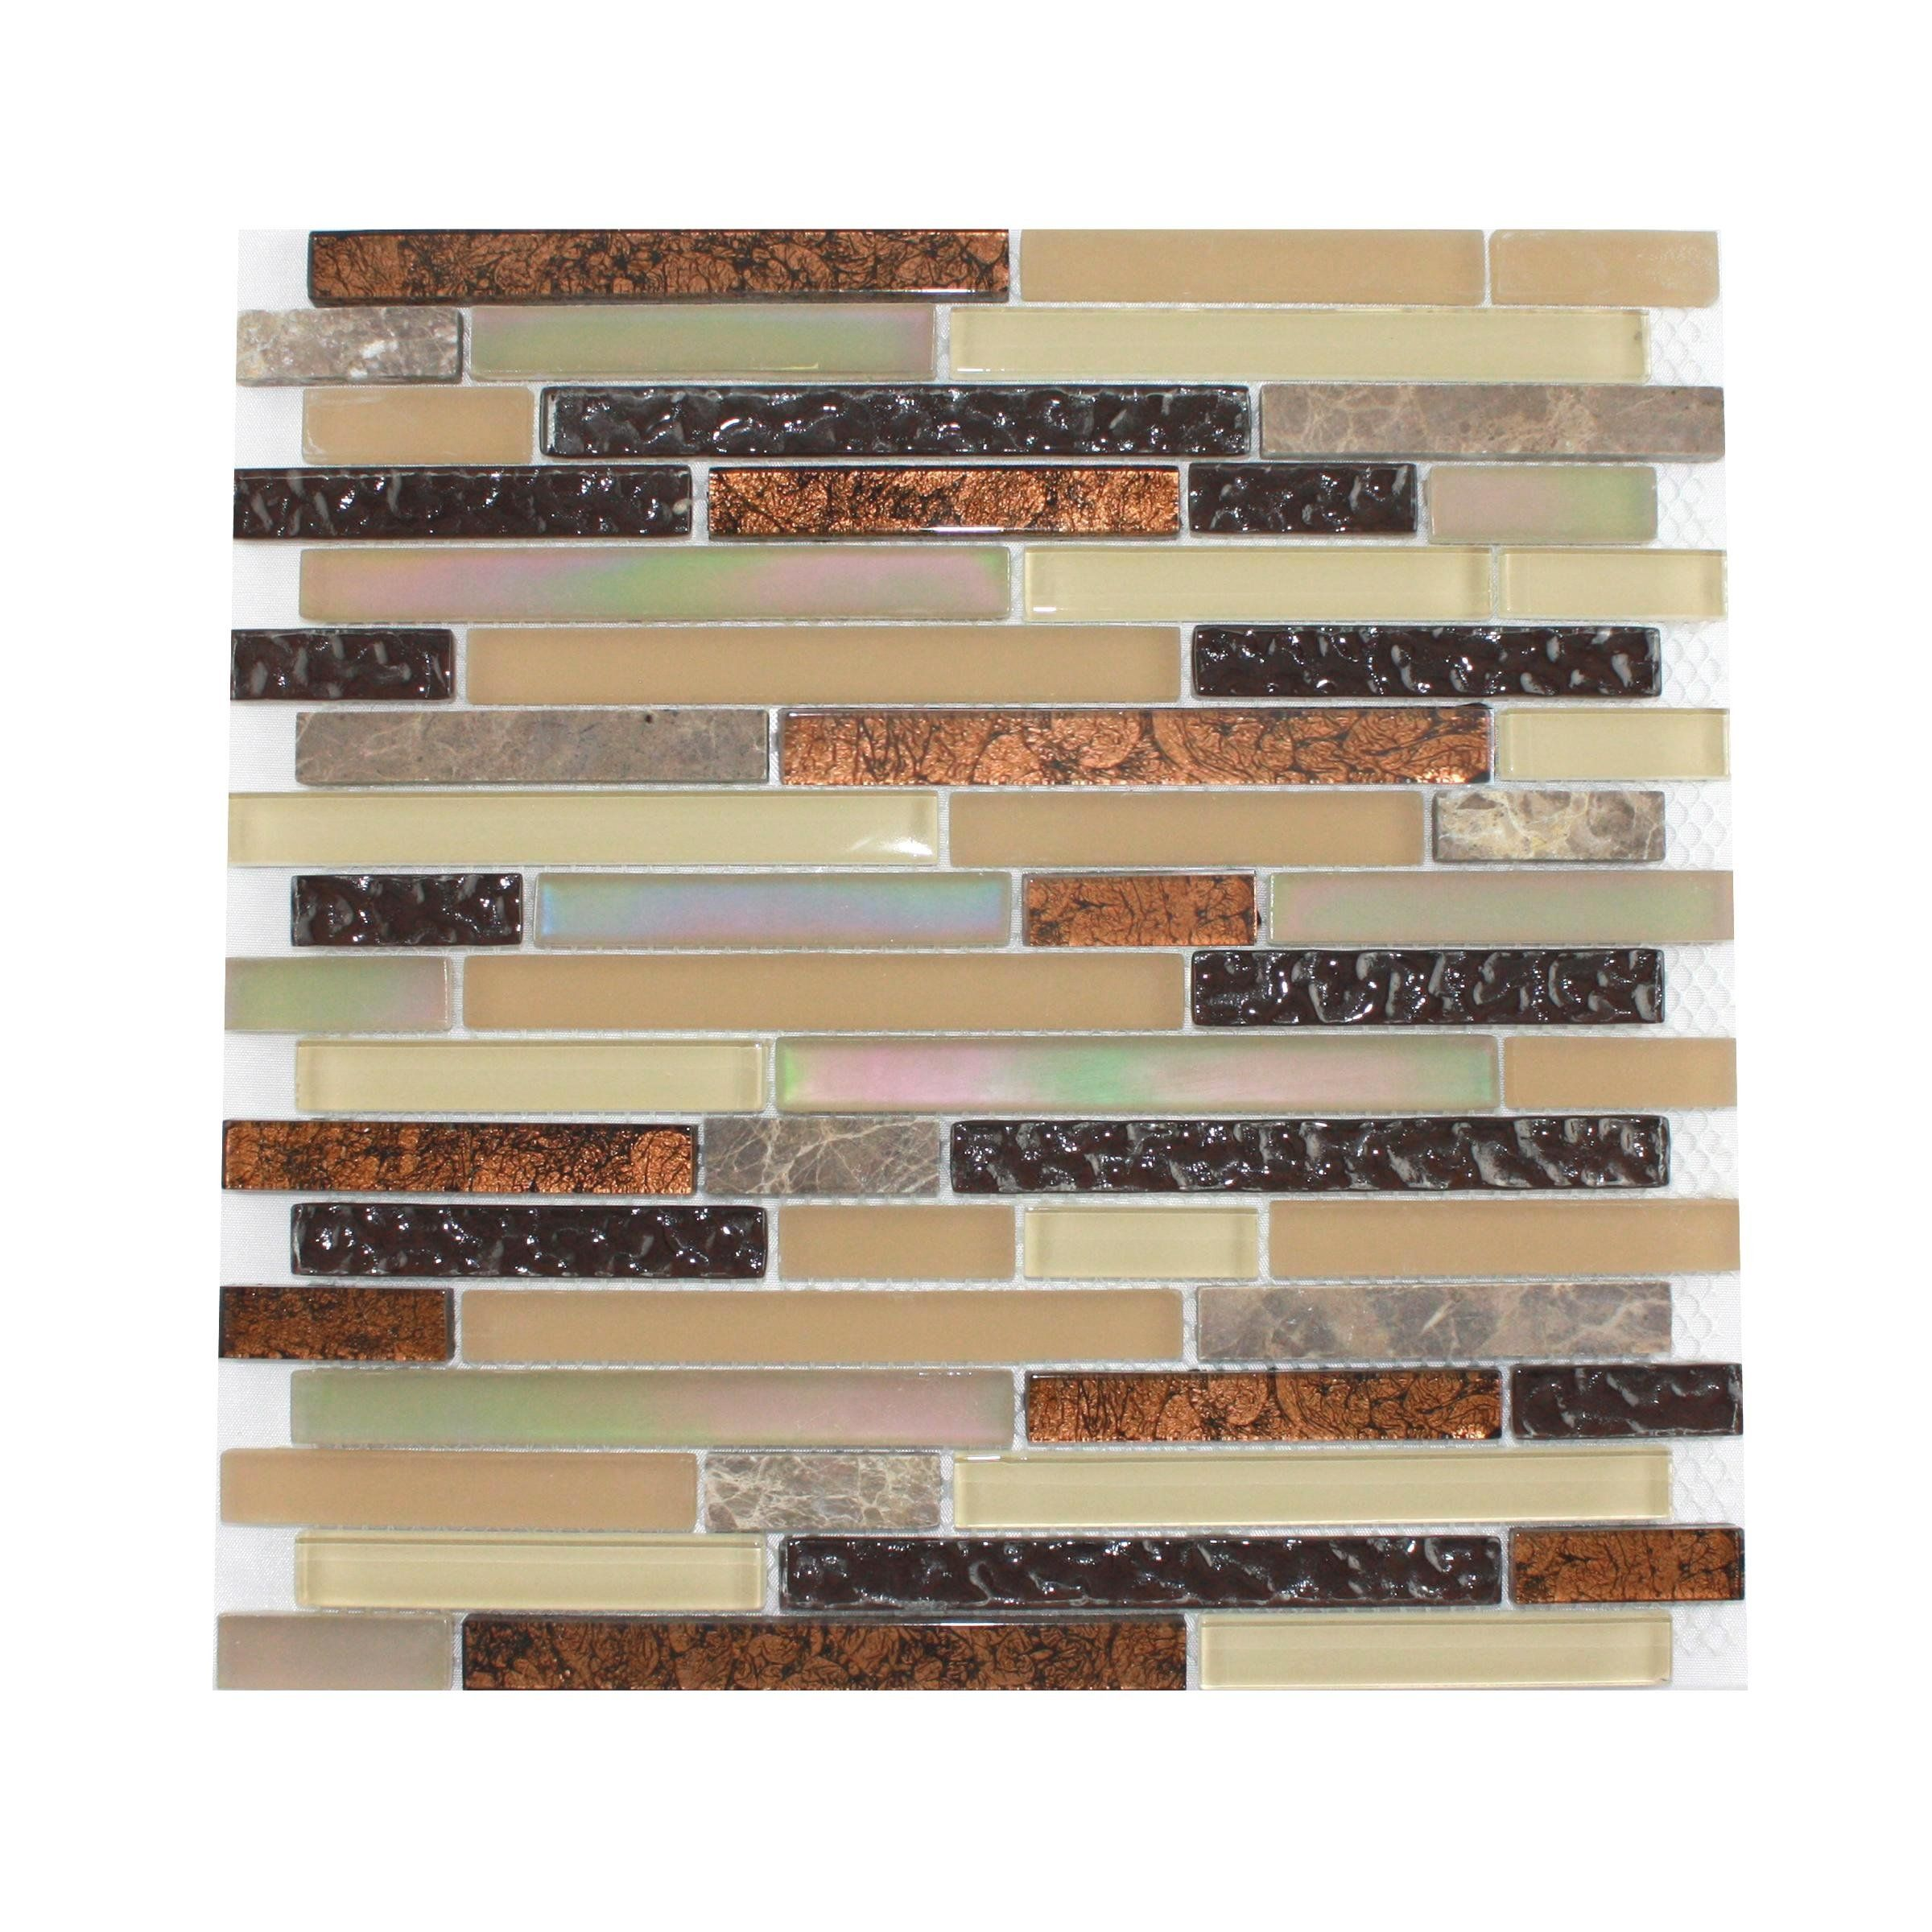 Glass Tile and Stone Copper Strips Mosaic Backsplash Glass Tiles